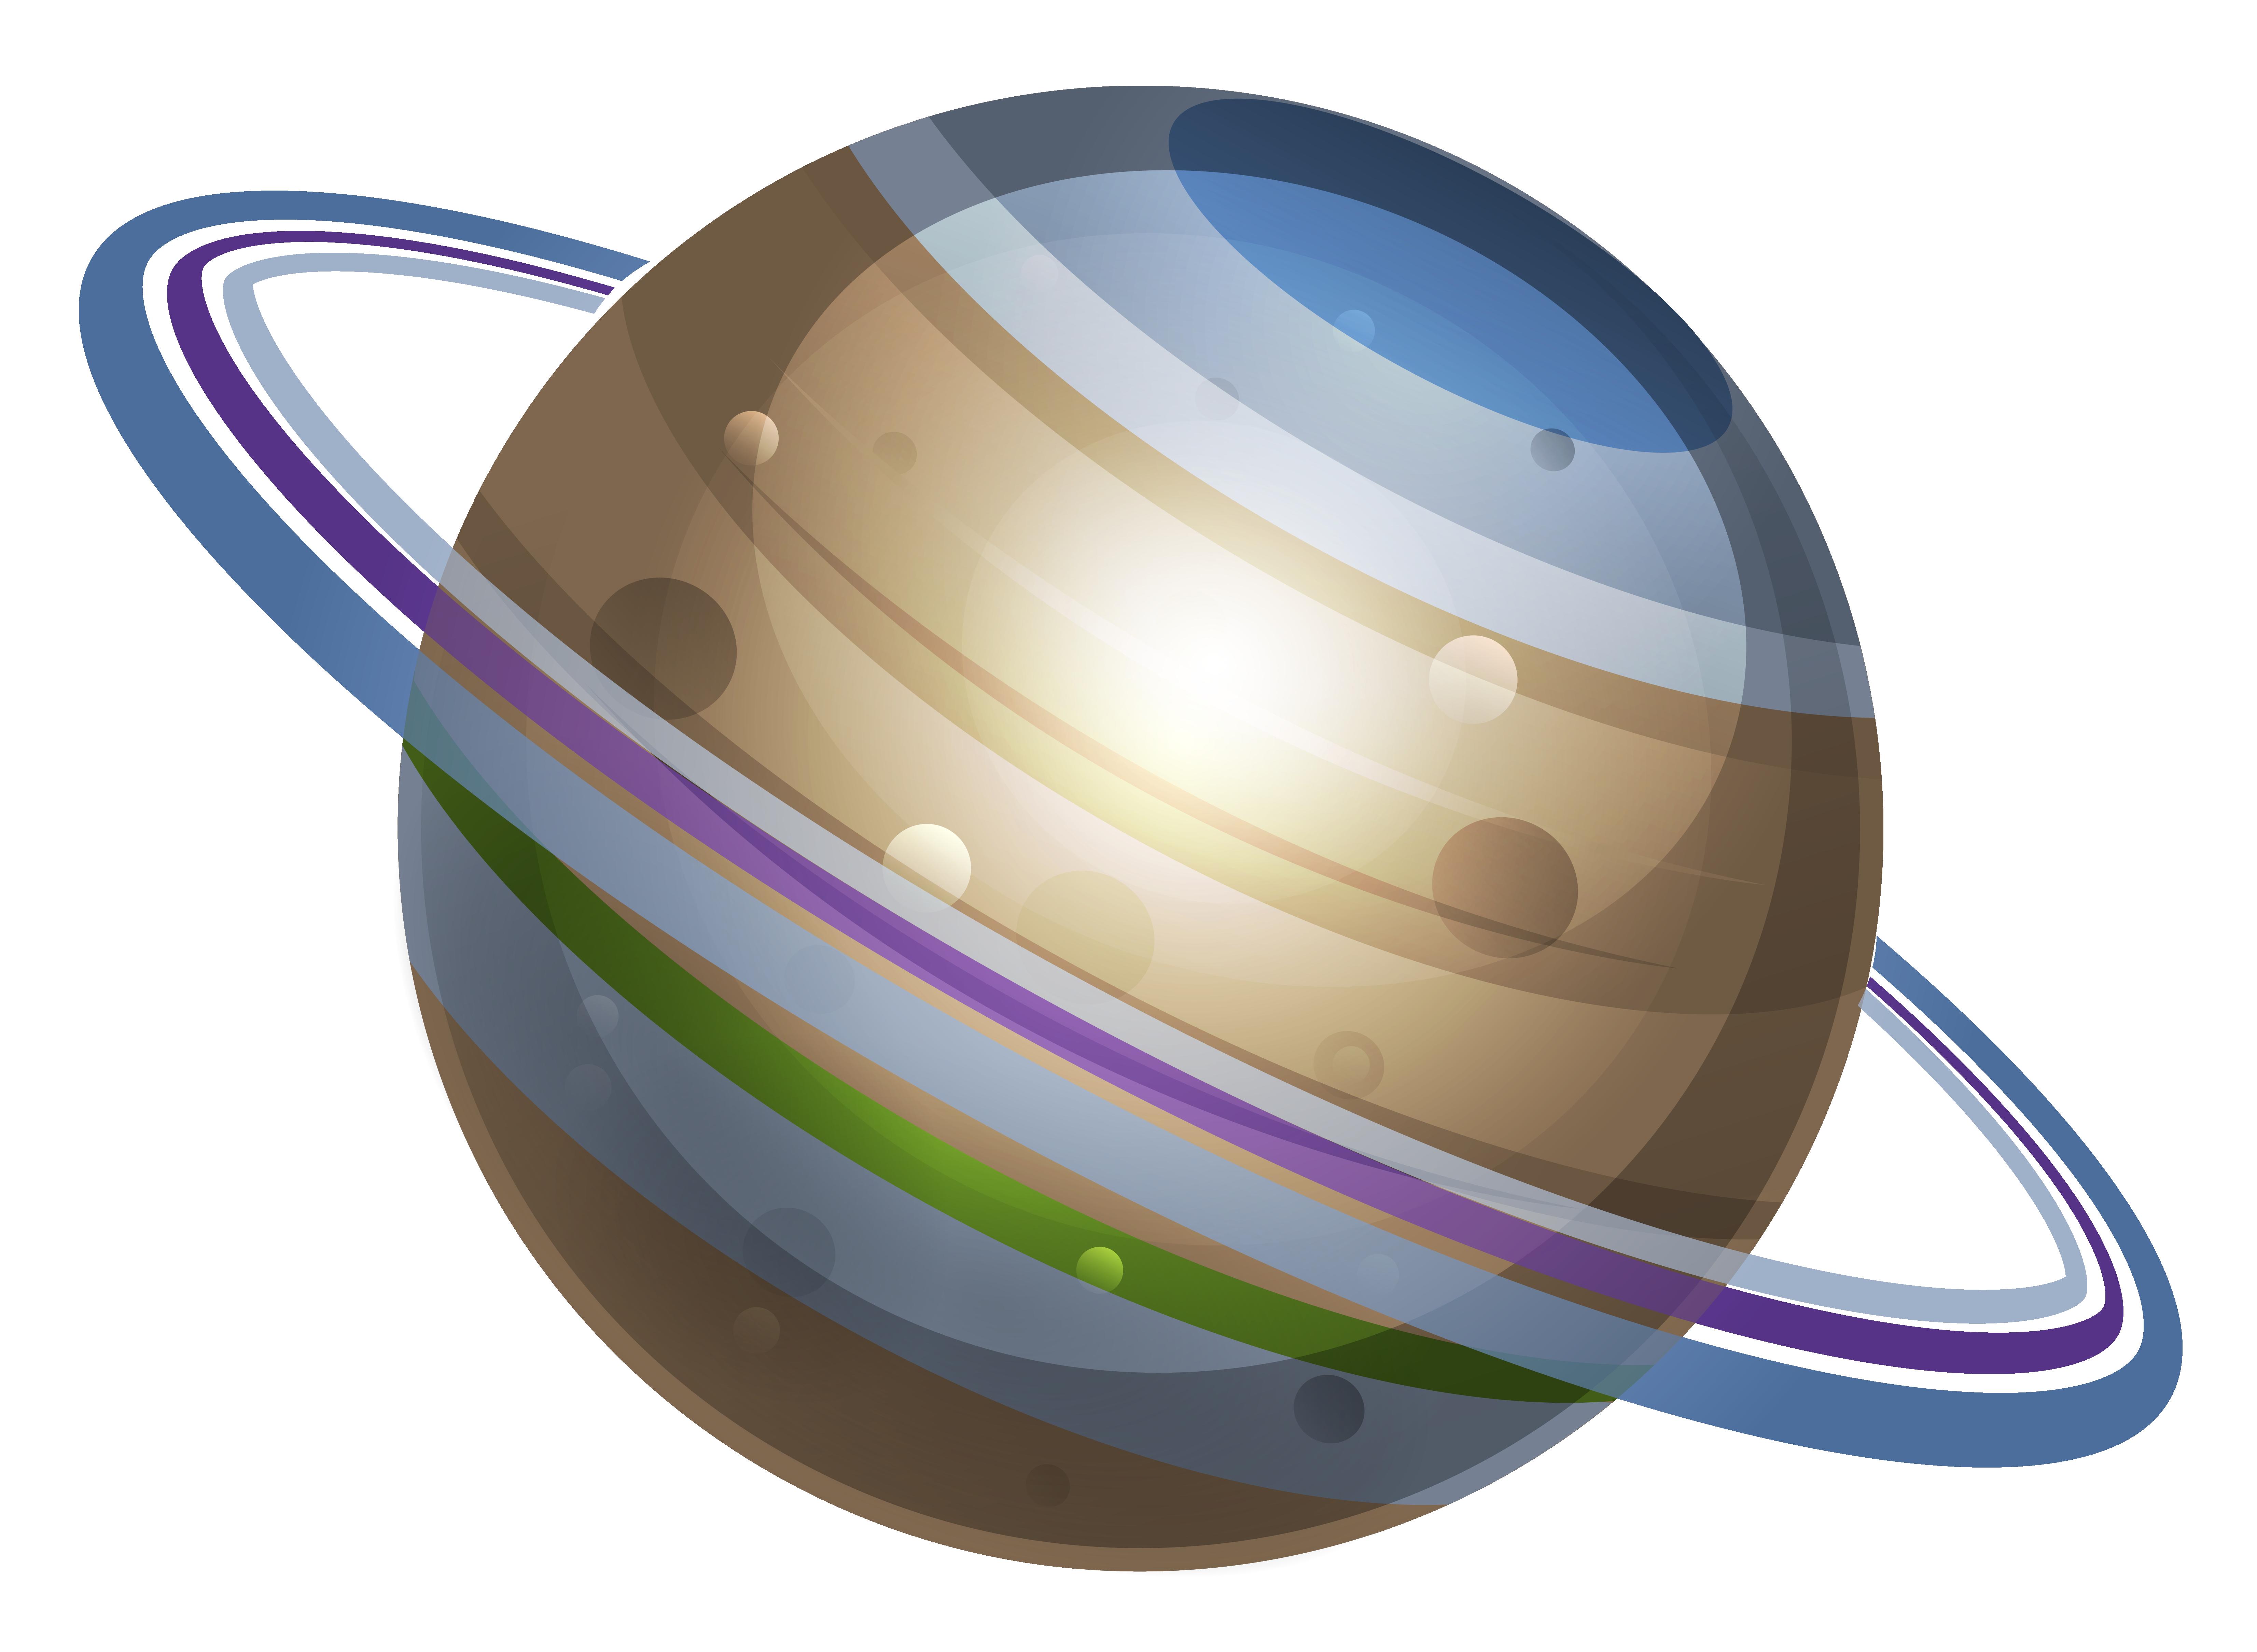 Planet School Model PNG Clipart Image.